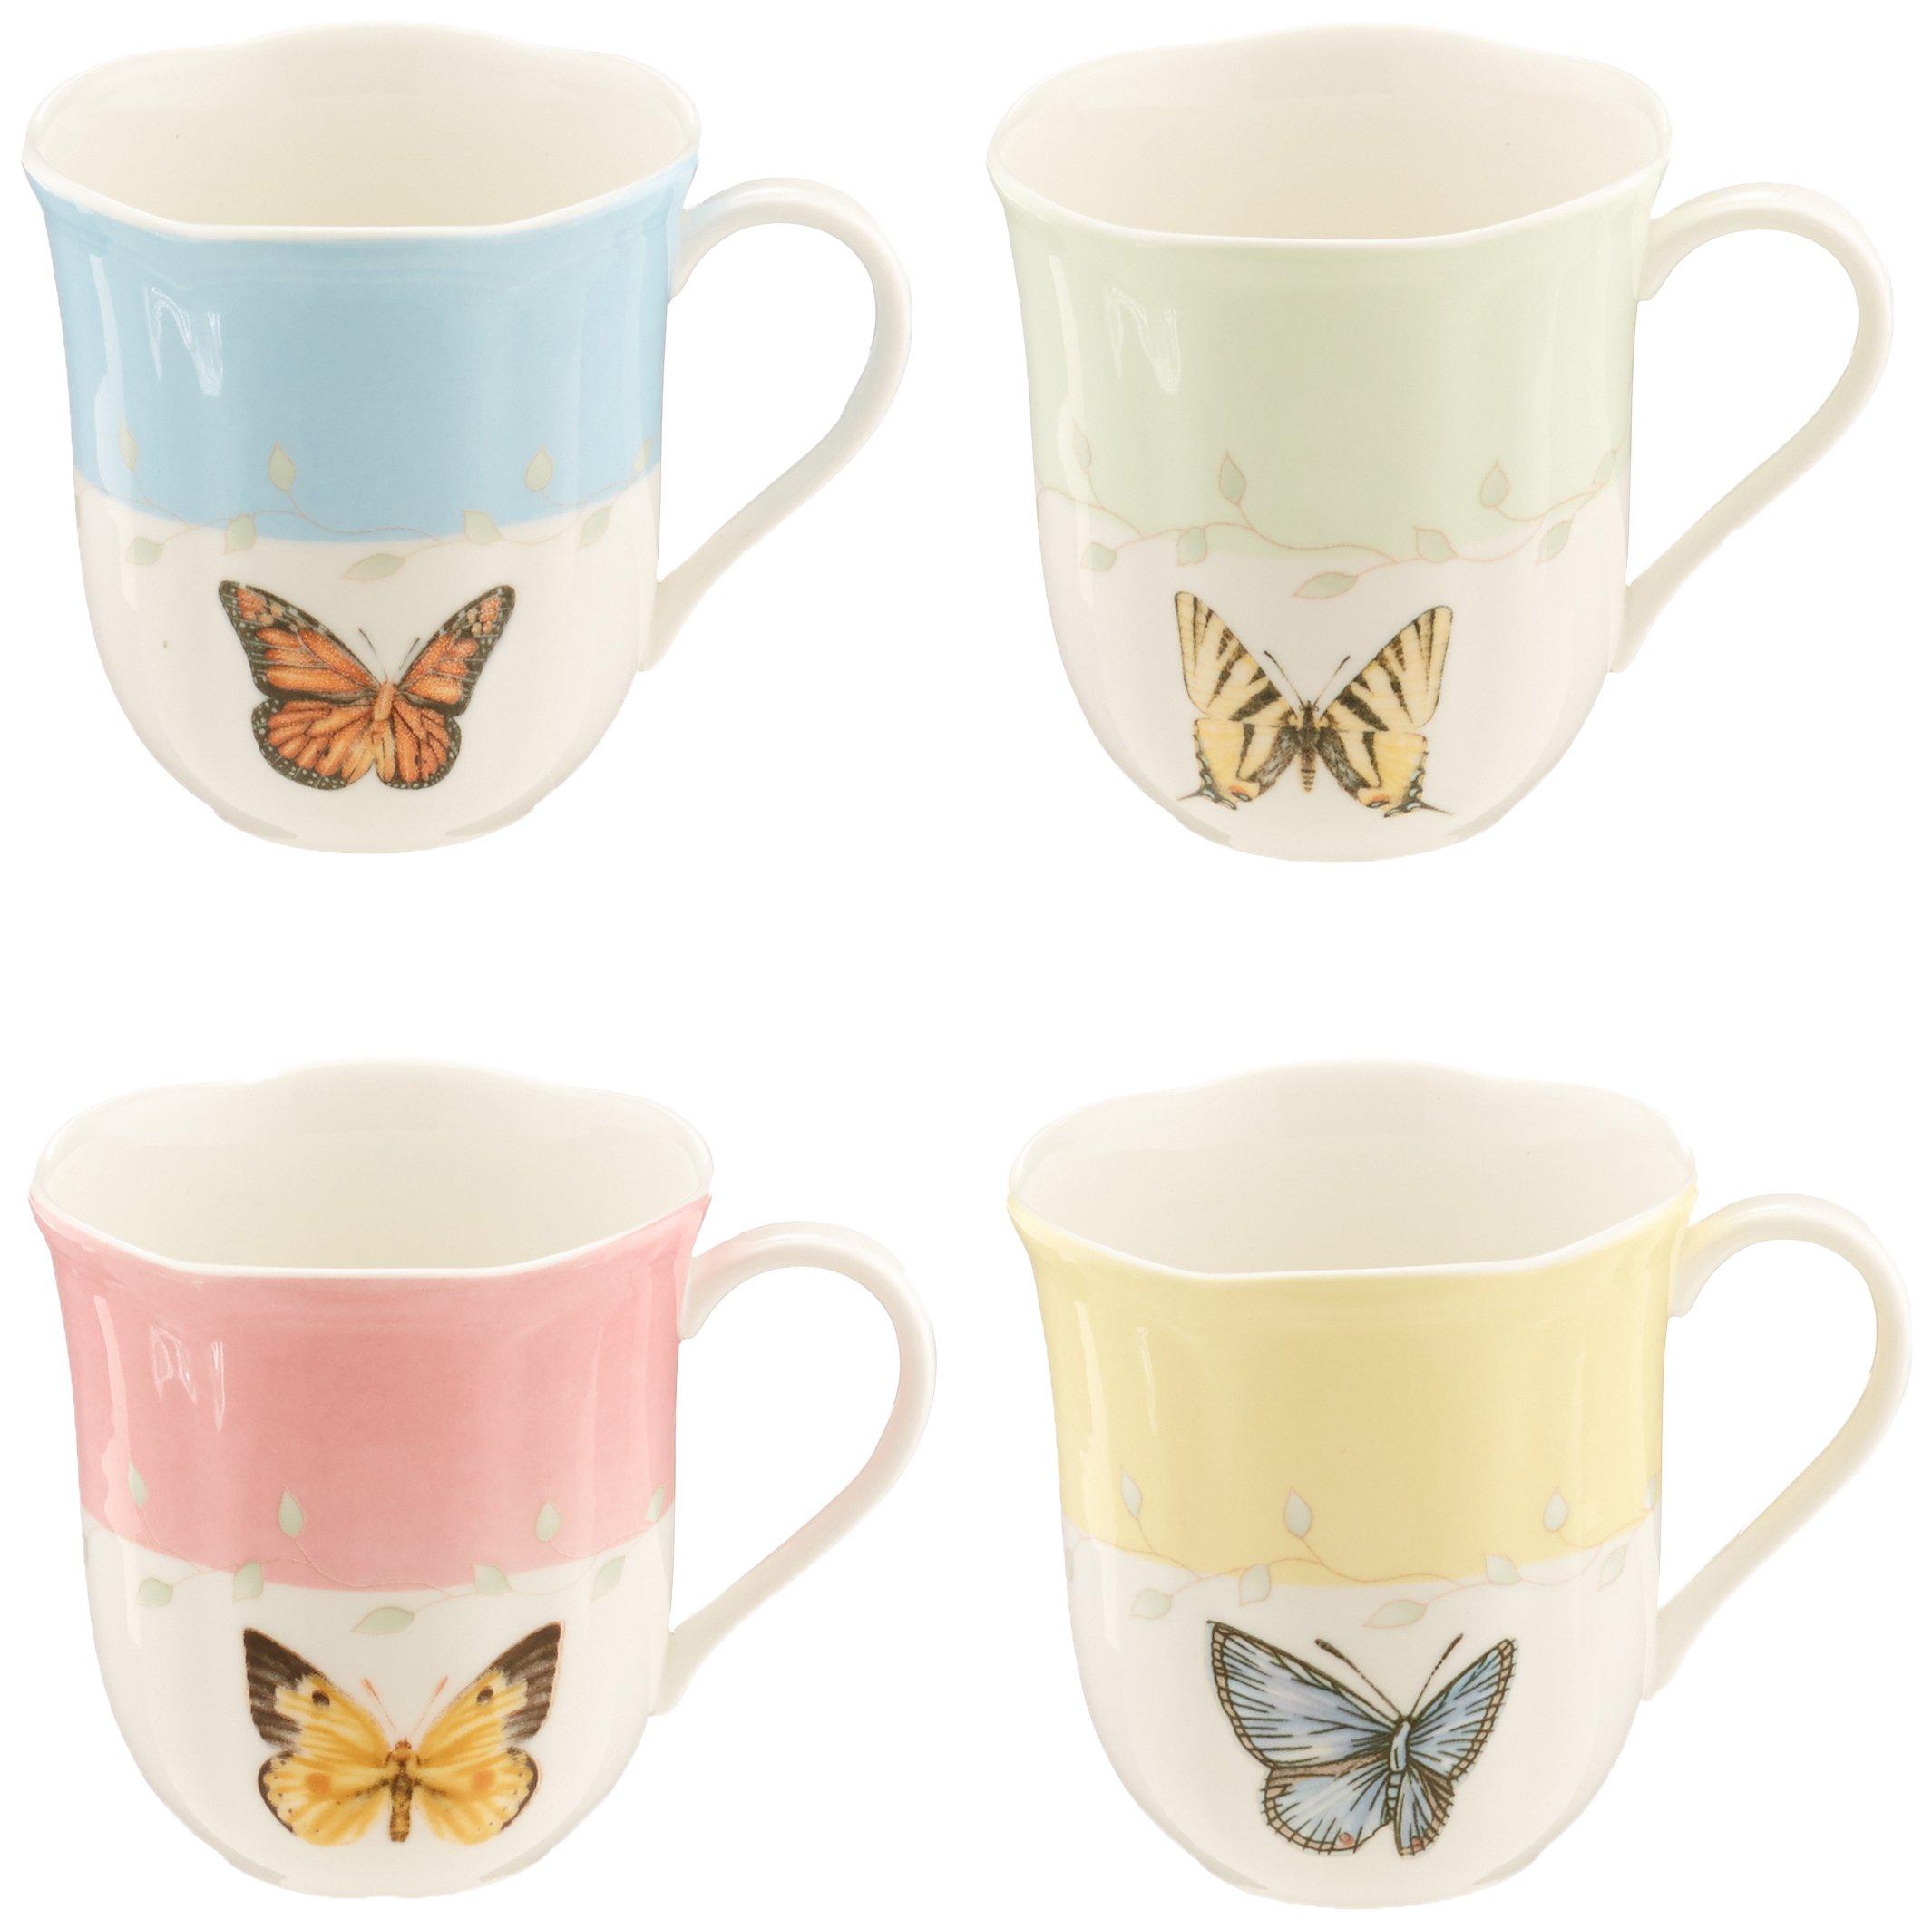 Lenox Butterfly Meadow Mug Set of 4 White Dinnerware